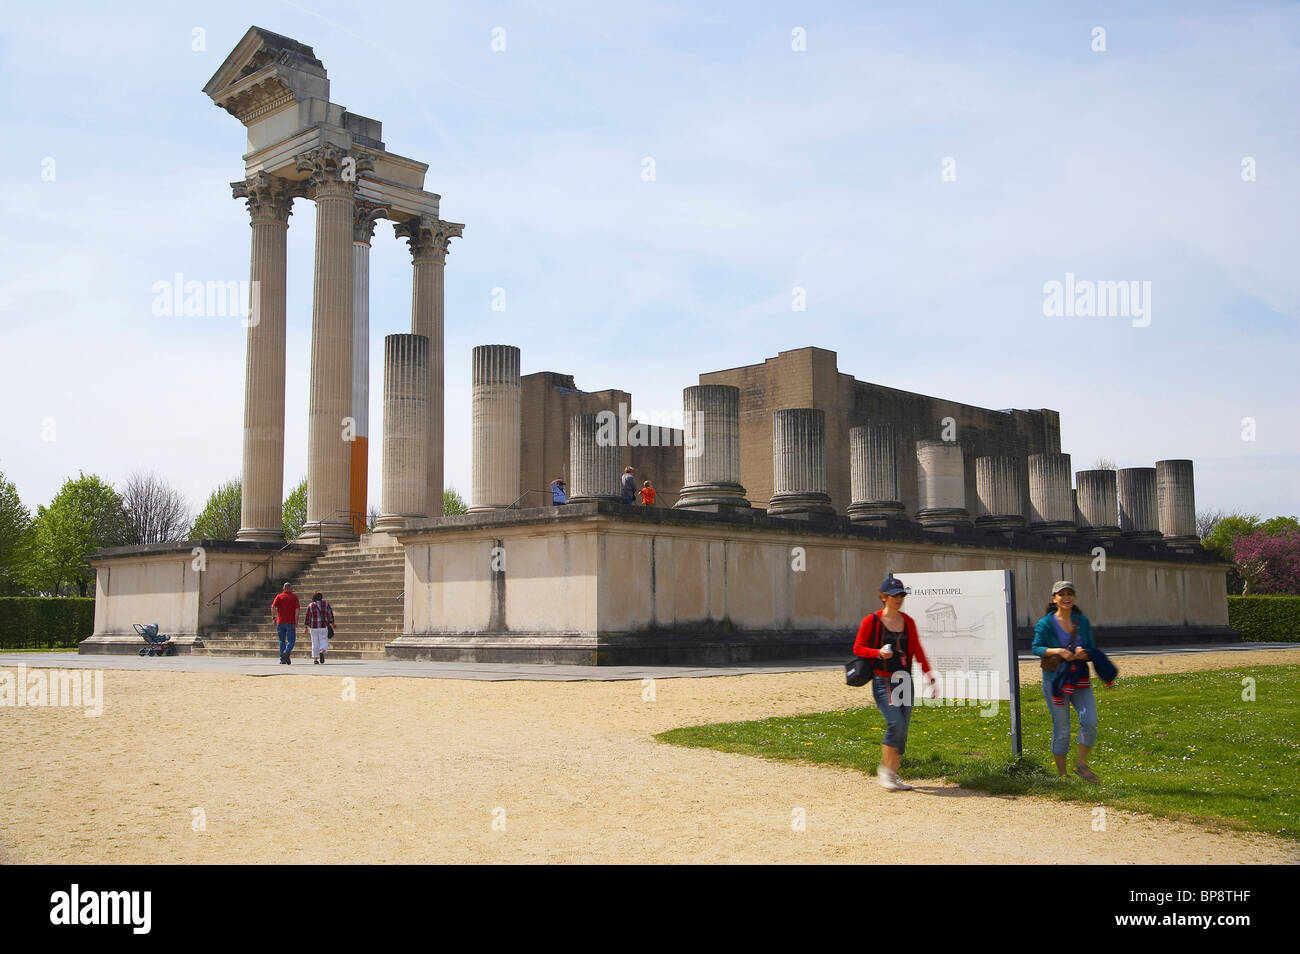 Archaeologic park in Xanten, spring, Niederrhein, North Rhine-Westphalia, Germany, Europe - Stock Image